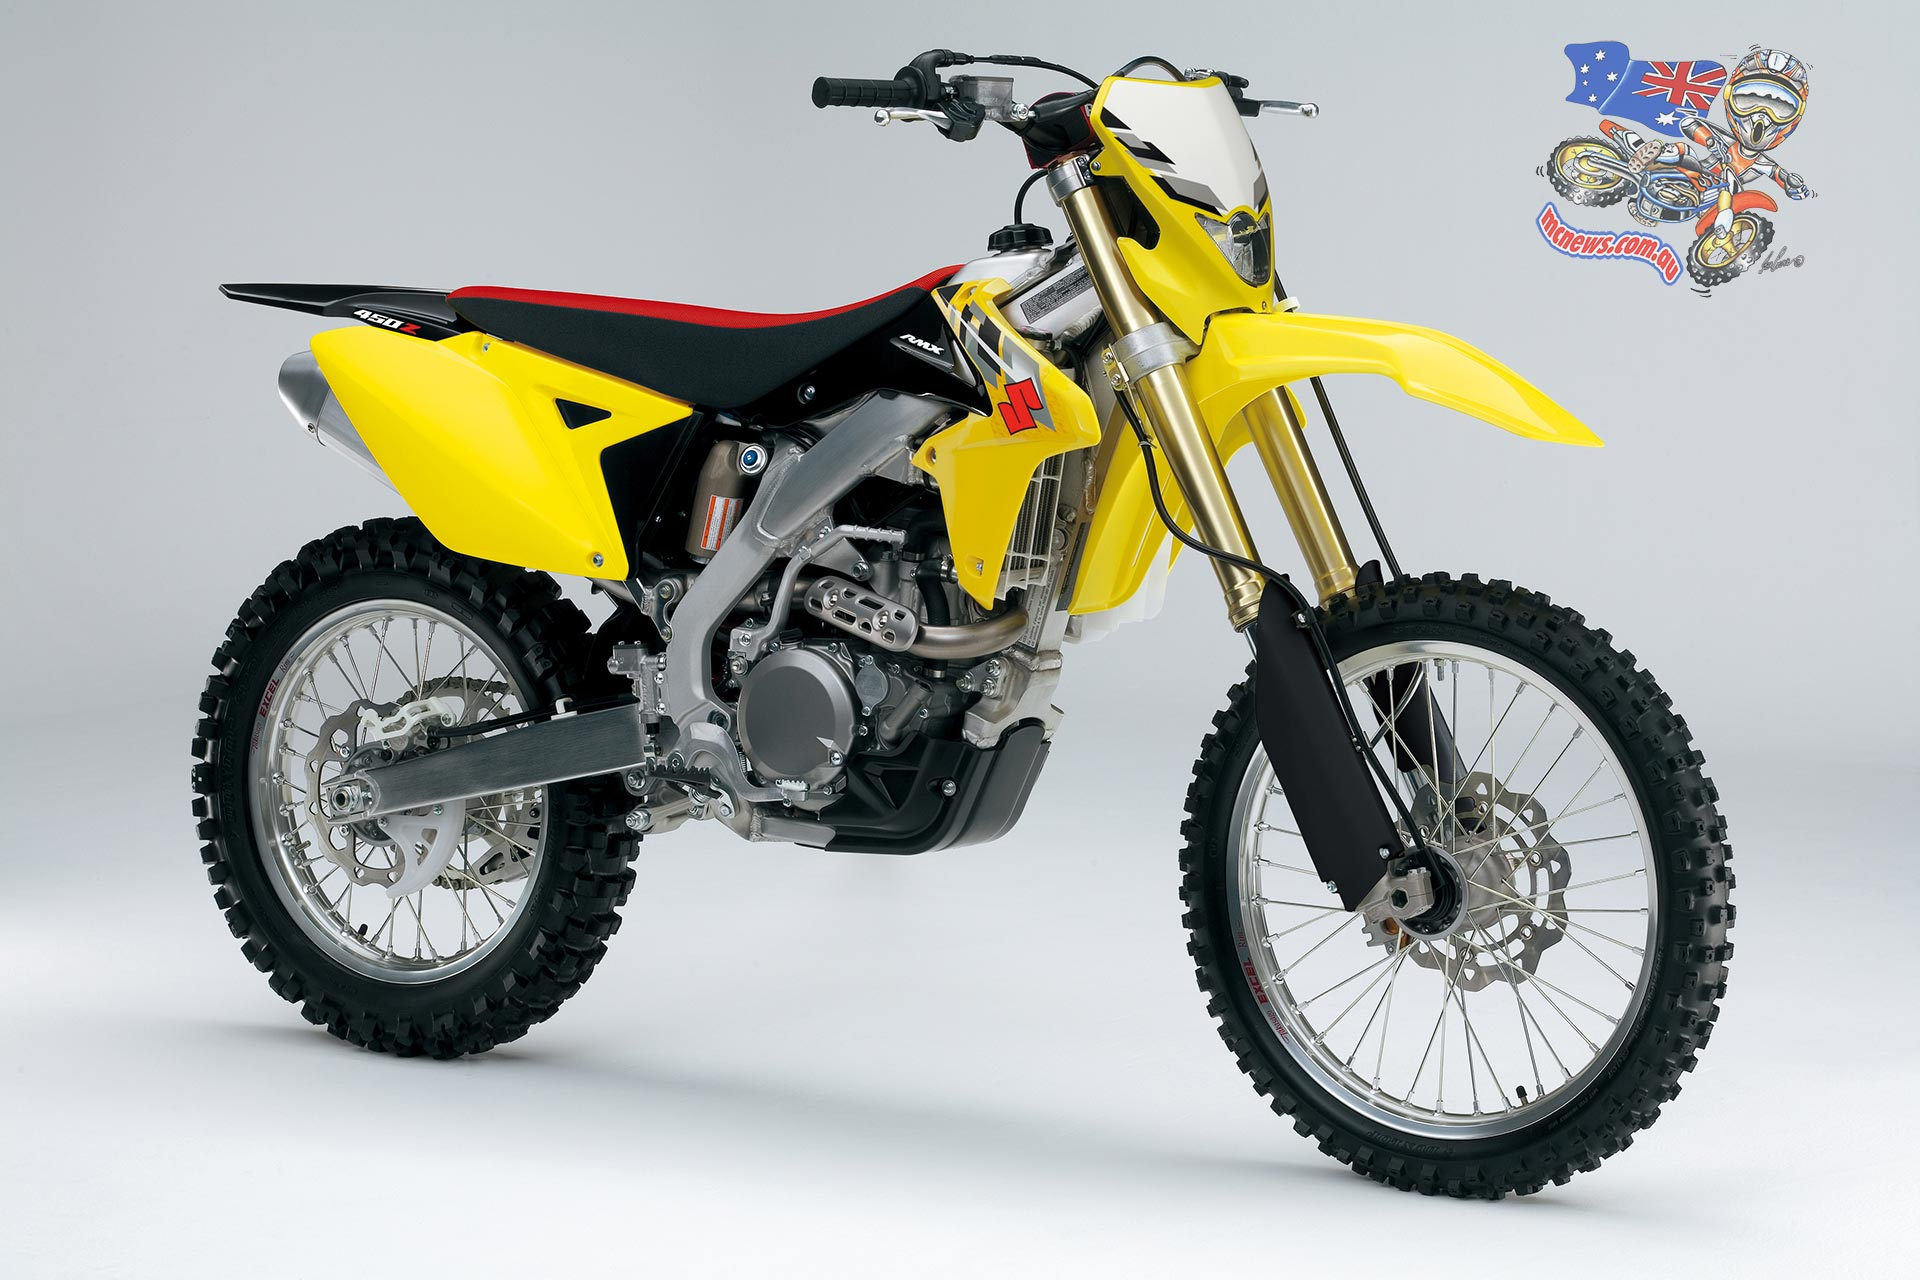 2015 Suzuki RMX450Z